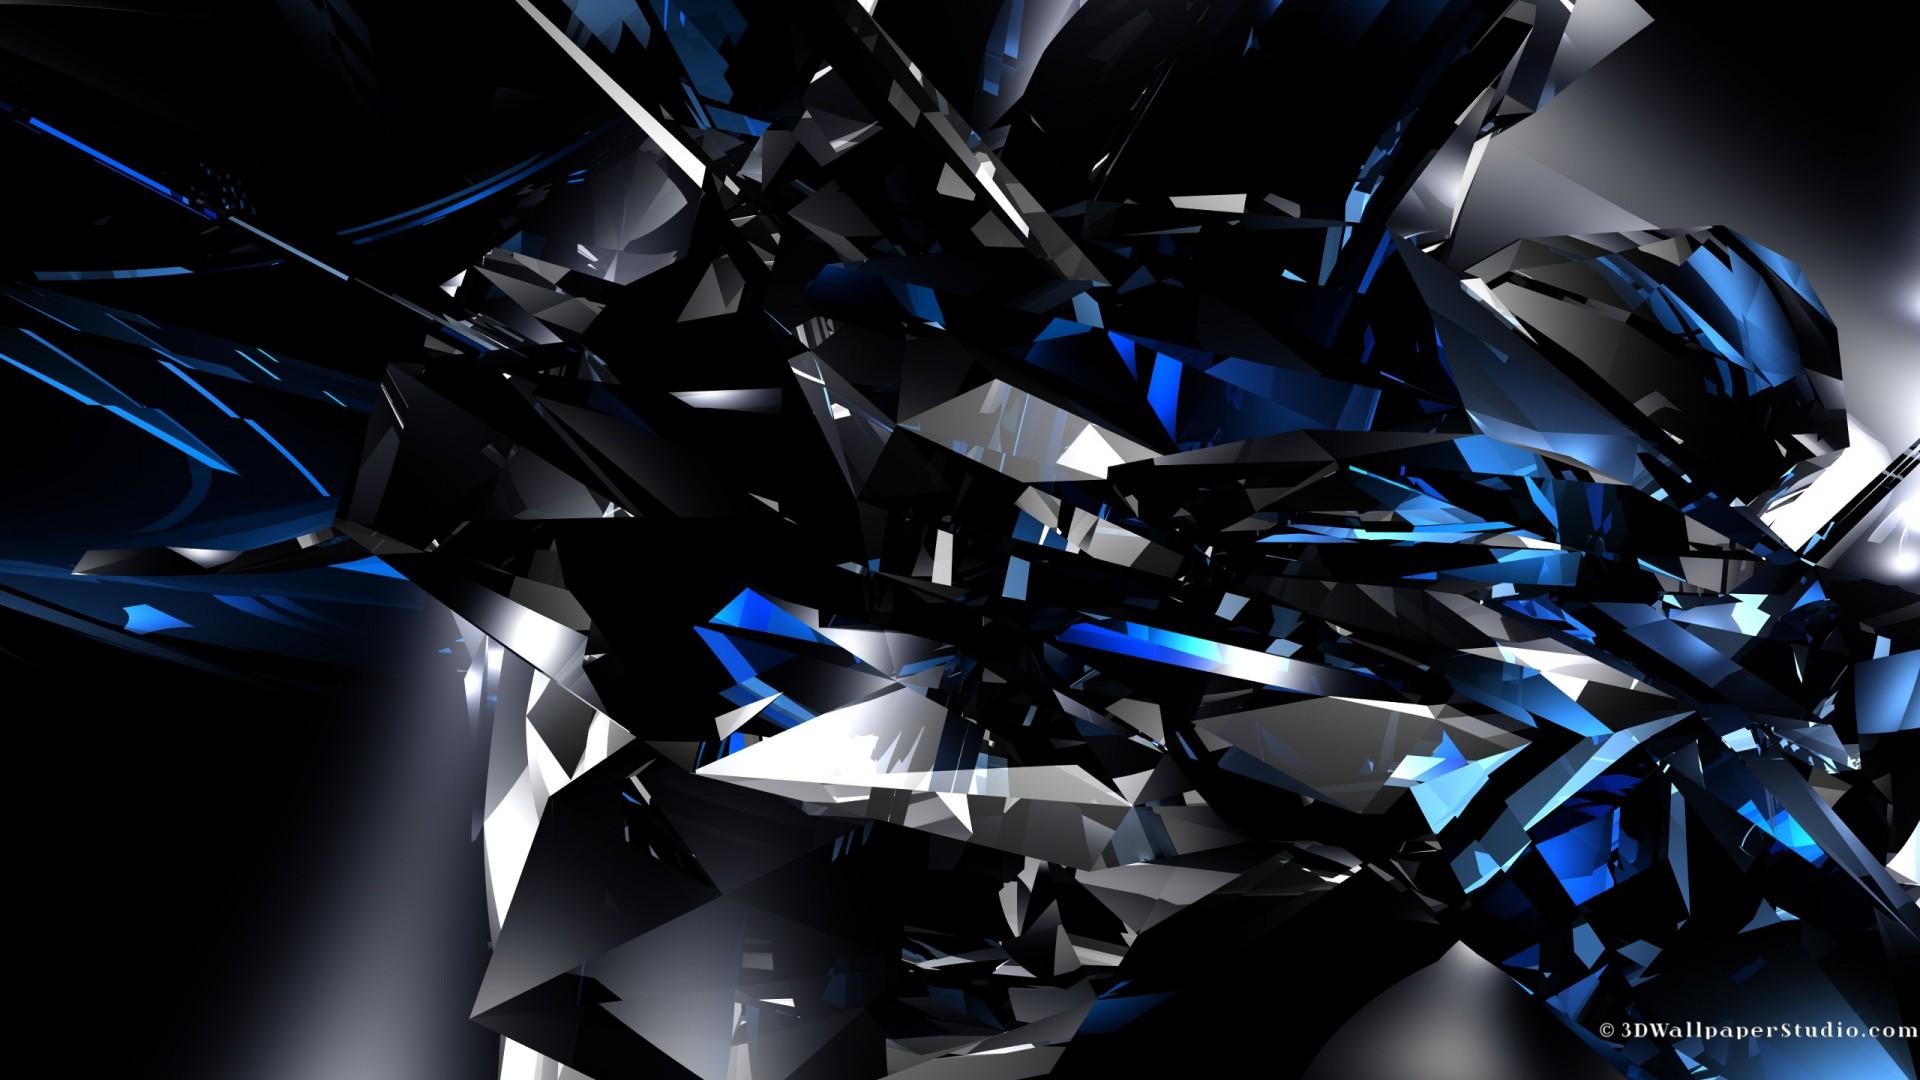 abstract blue wallpaper 1920x1080 abstract blue crystals digital